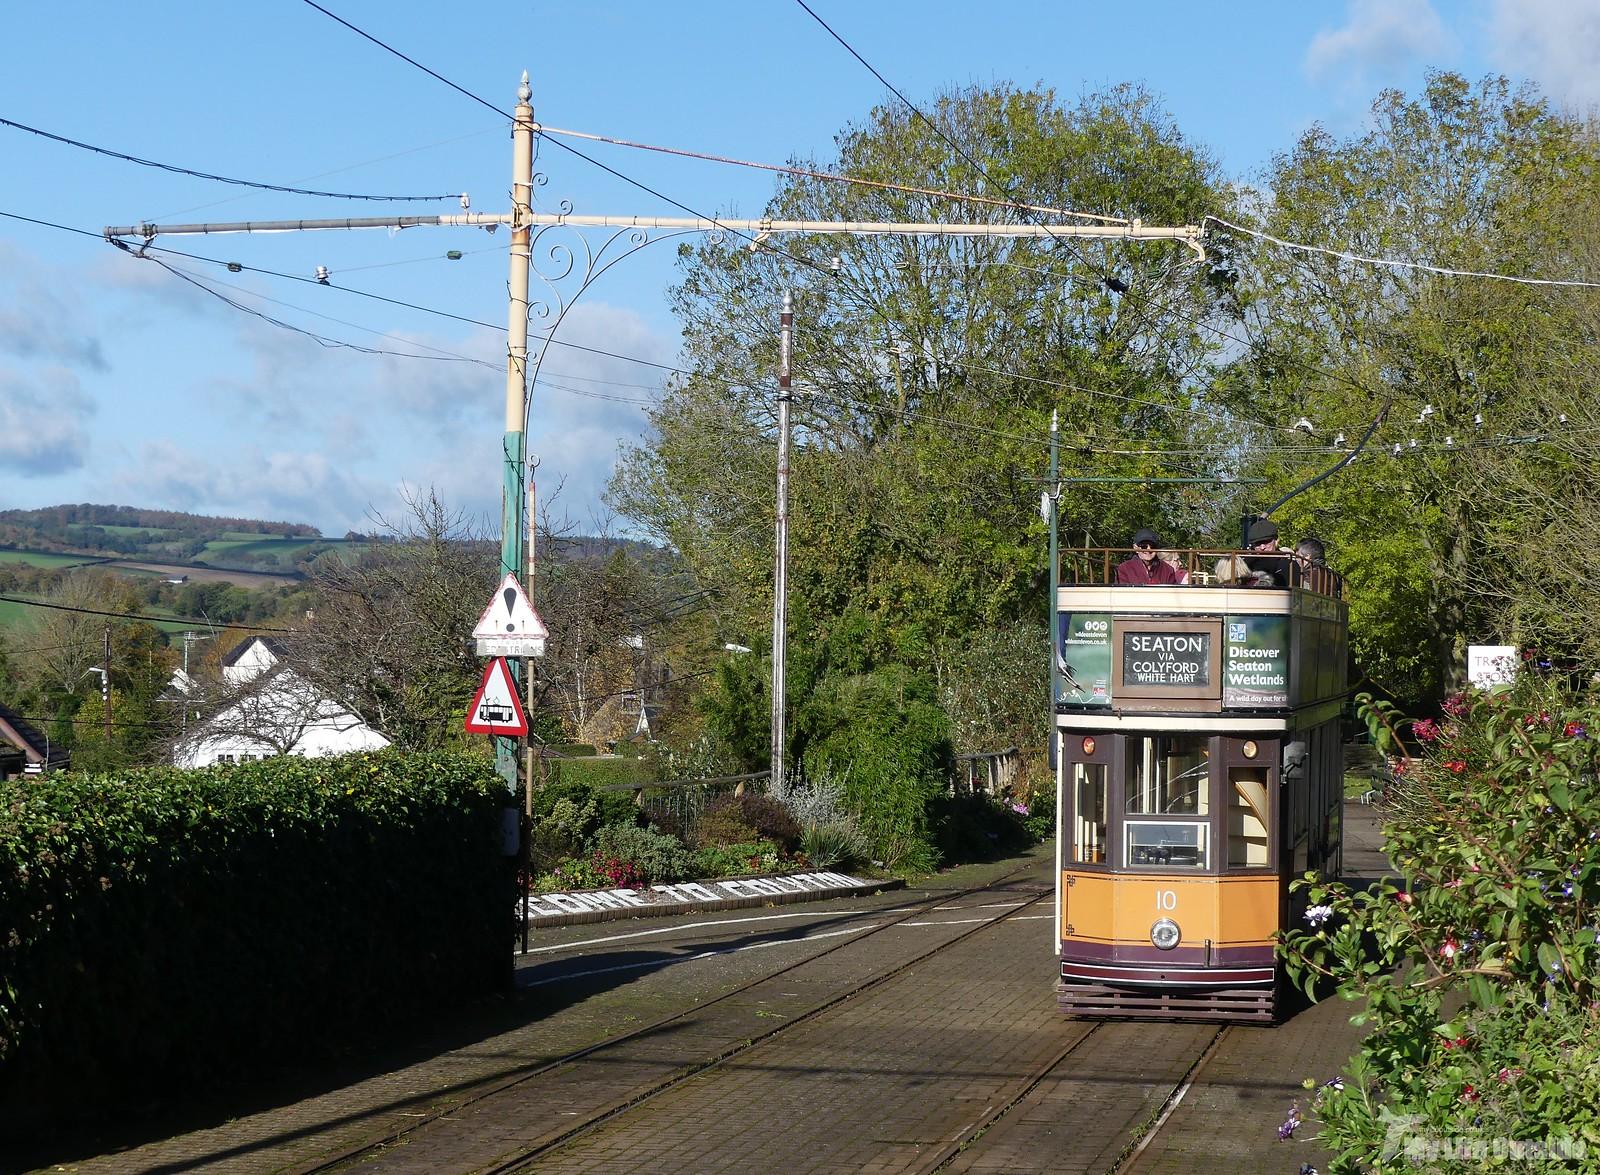 P1220376 - Seaton Tram